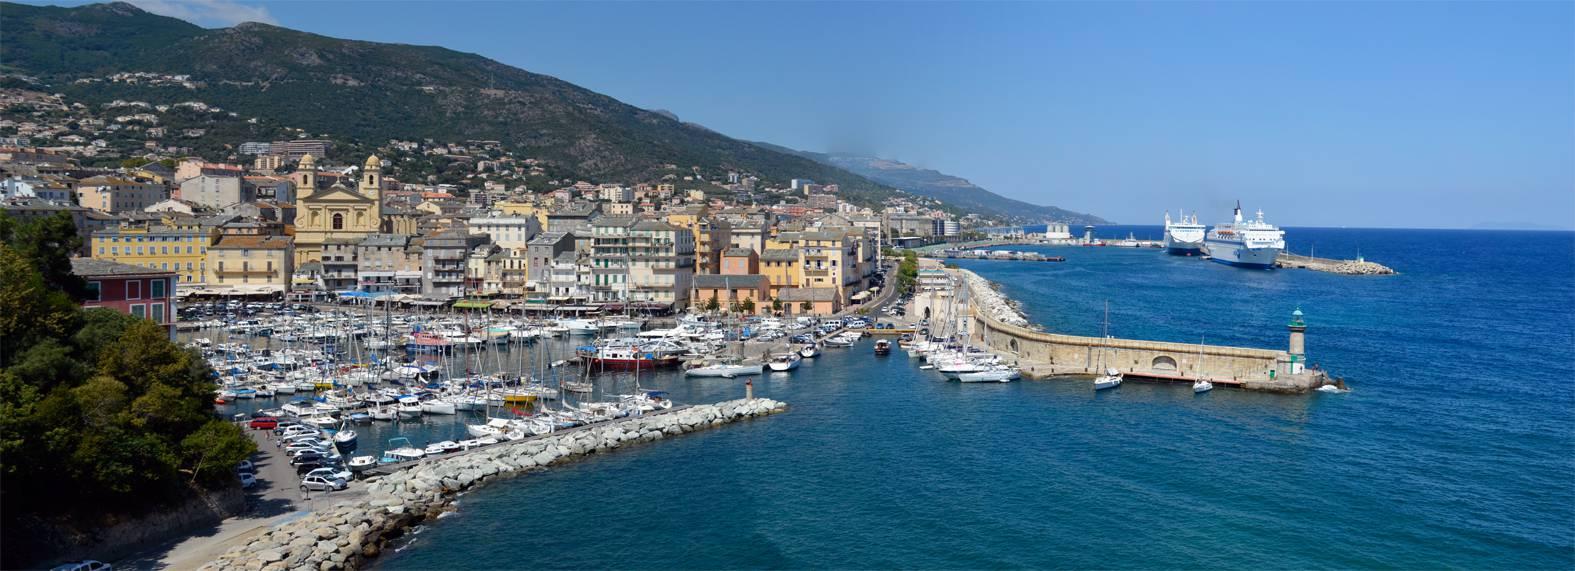 Visiter bastia pourquoi visiter bastia en haute corse - Vieux port bastia ...